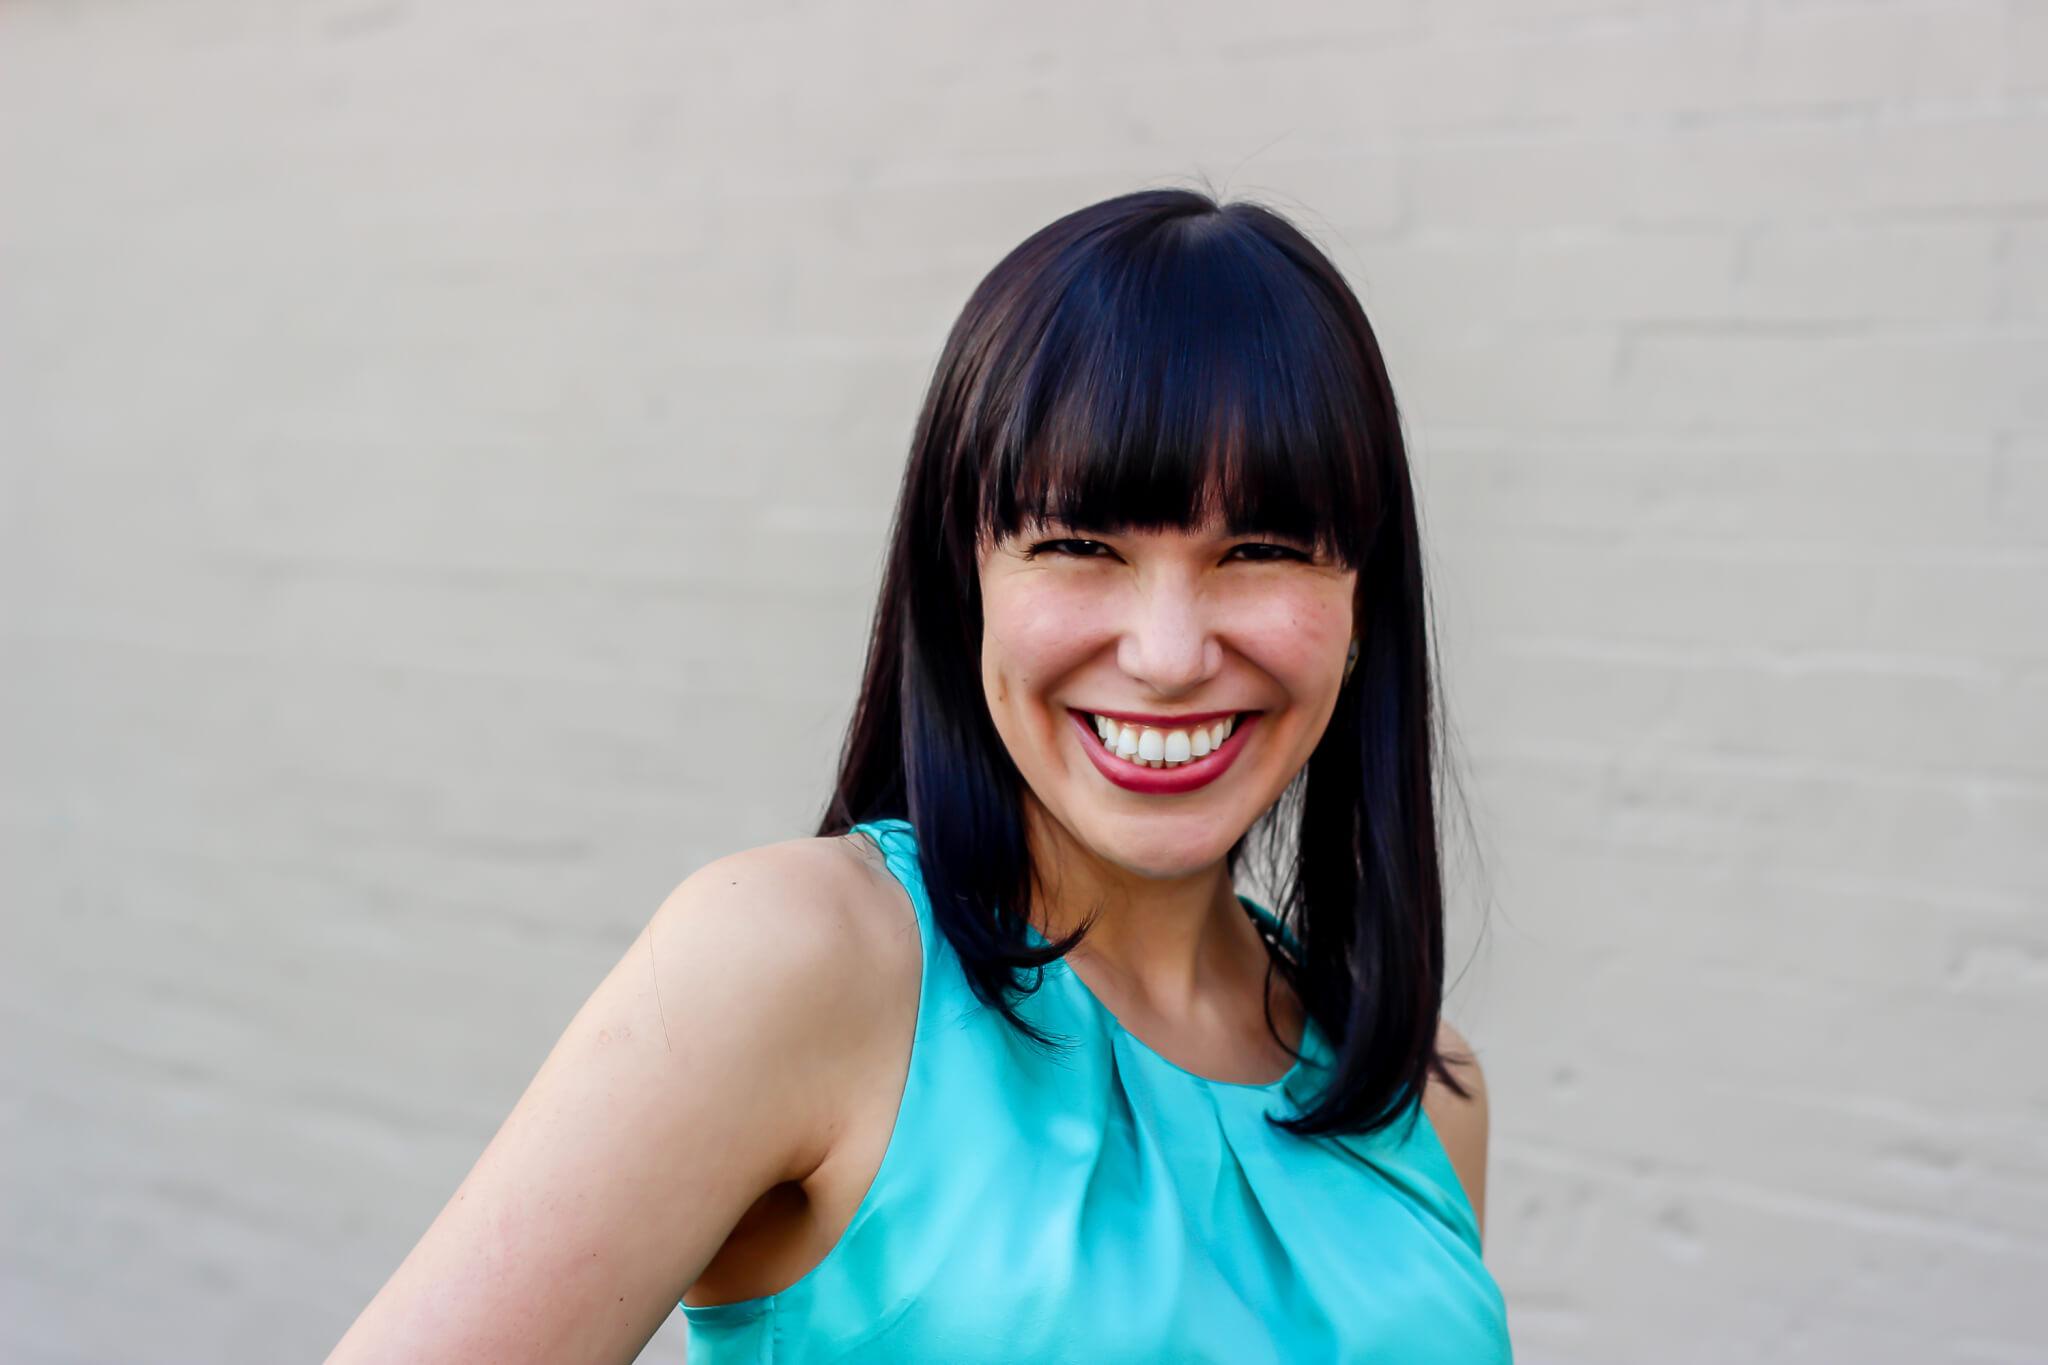 Lisa_Charleyboy (cr- Eyoälha Baker)